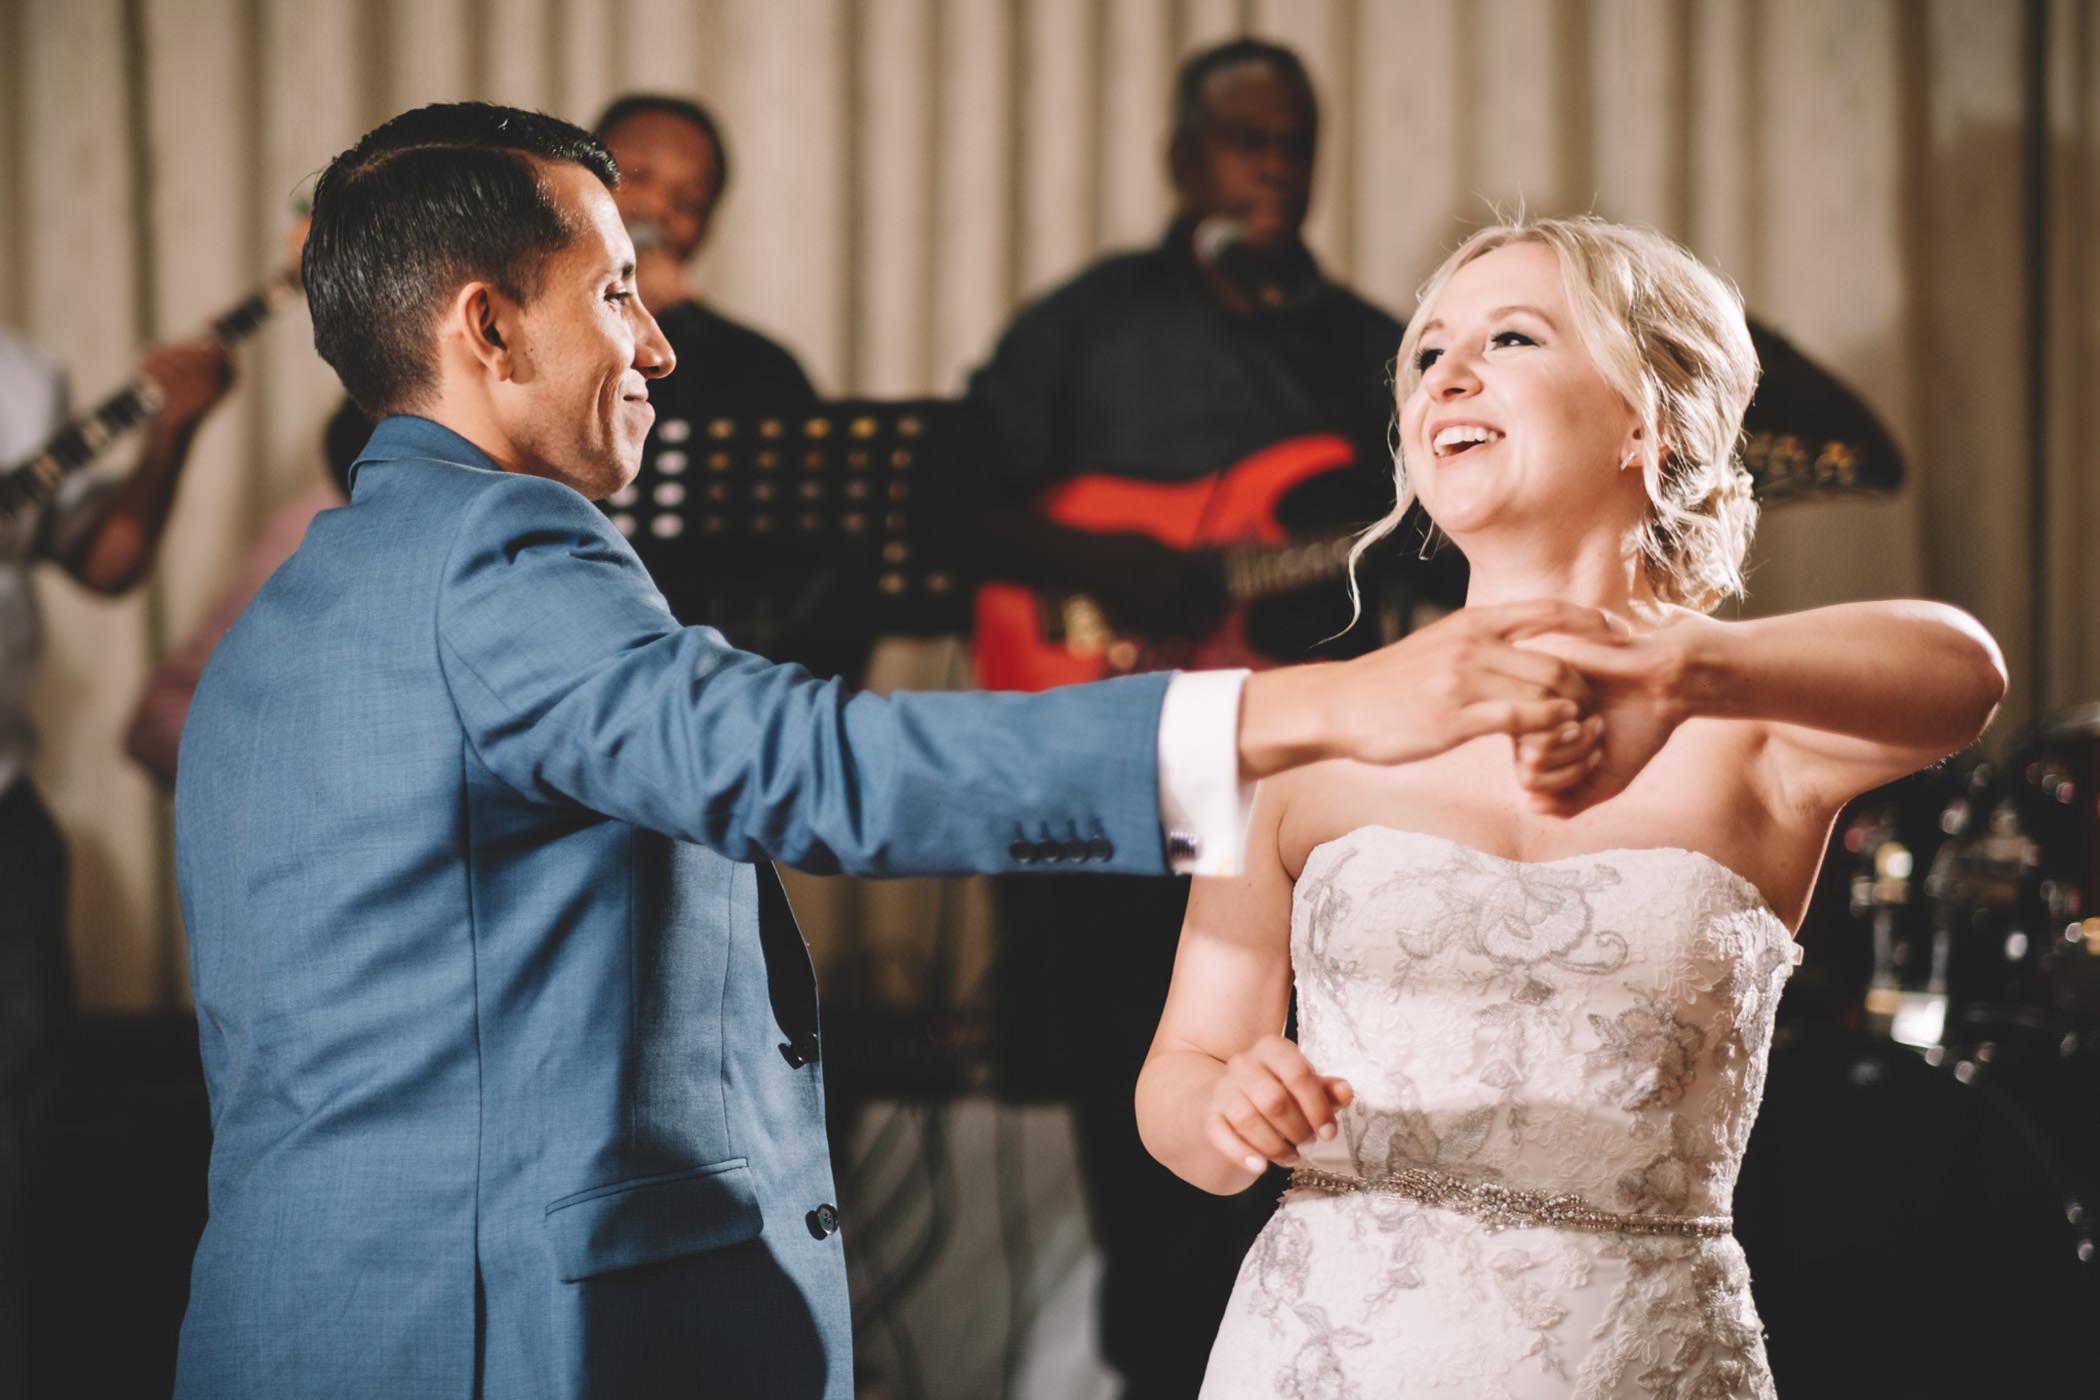 Bluff Wedding Photography Bride and Groom El Arish First Dance